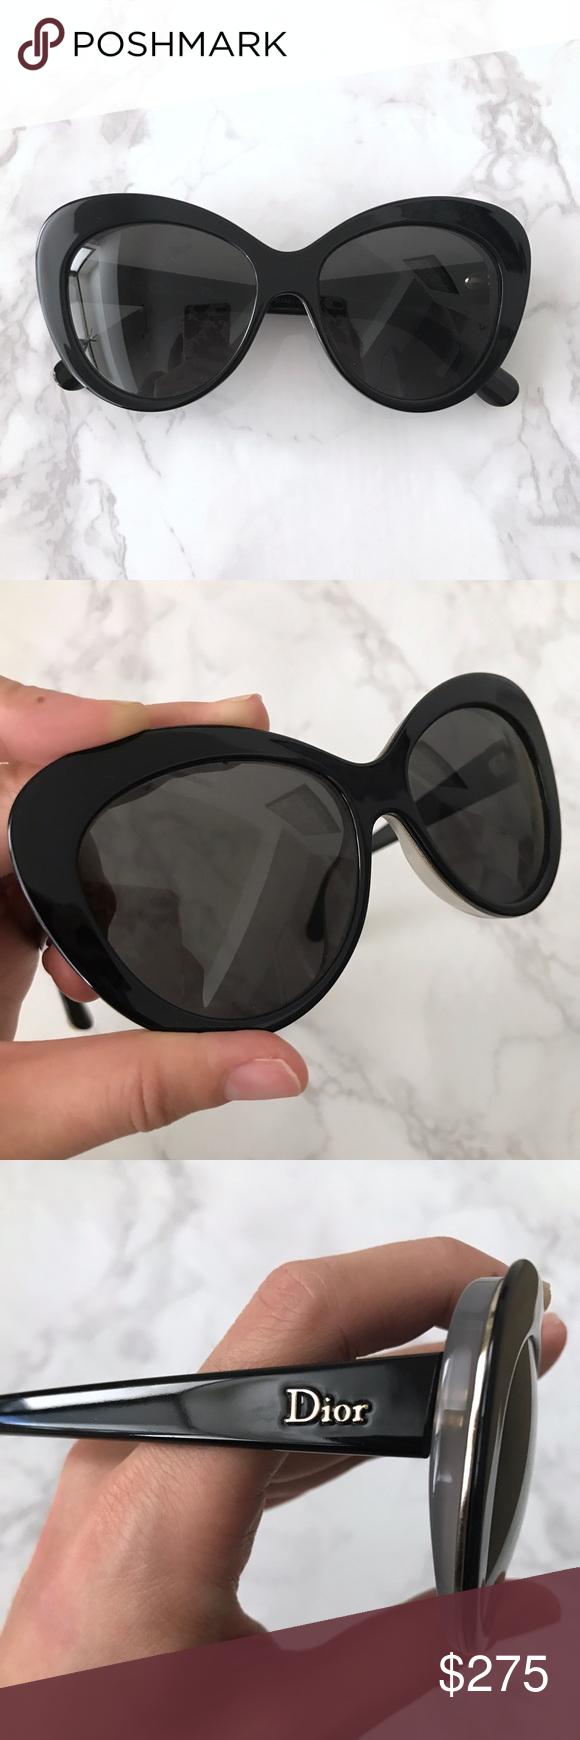 ea6417c1df4c Dior Cateye Sunglasses Gently used Dior Promessel Cateye sunglasses. Darkest  navy (pretty much black